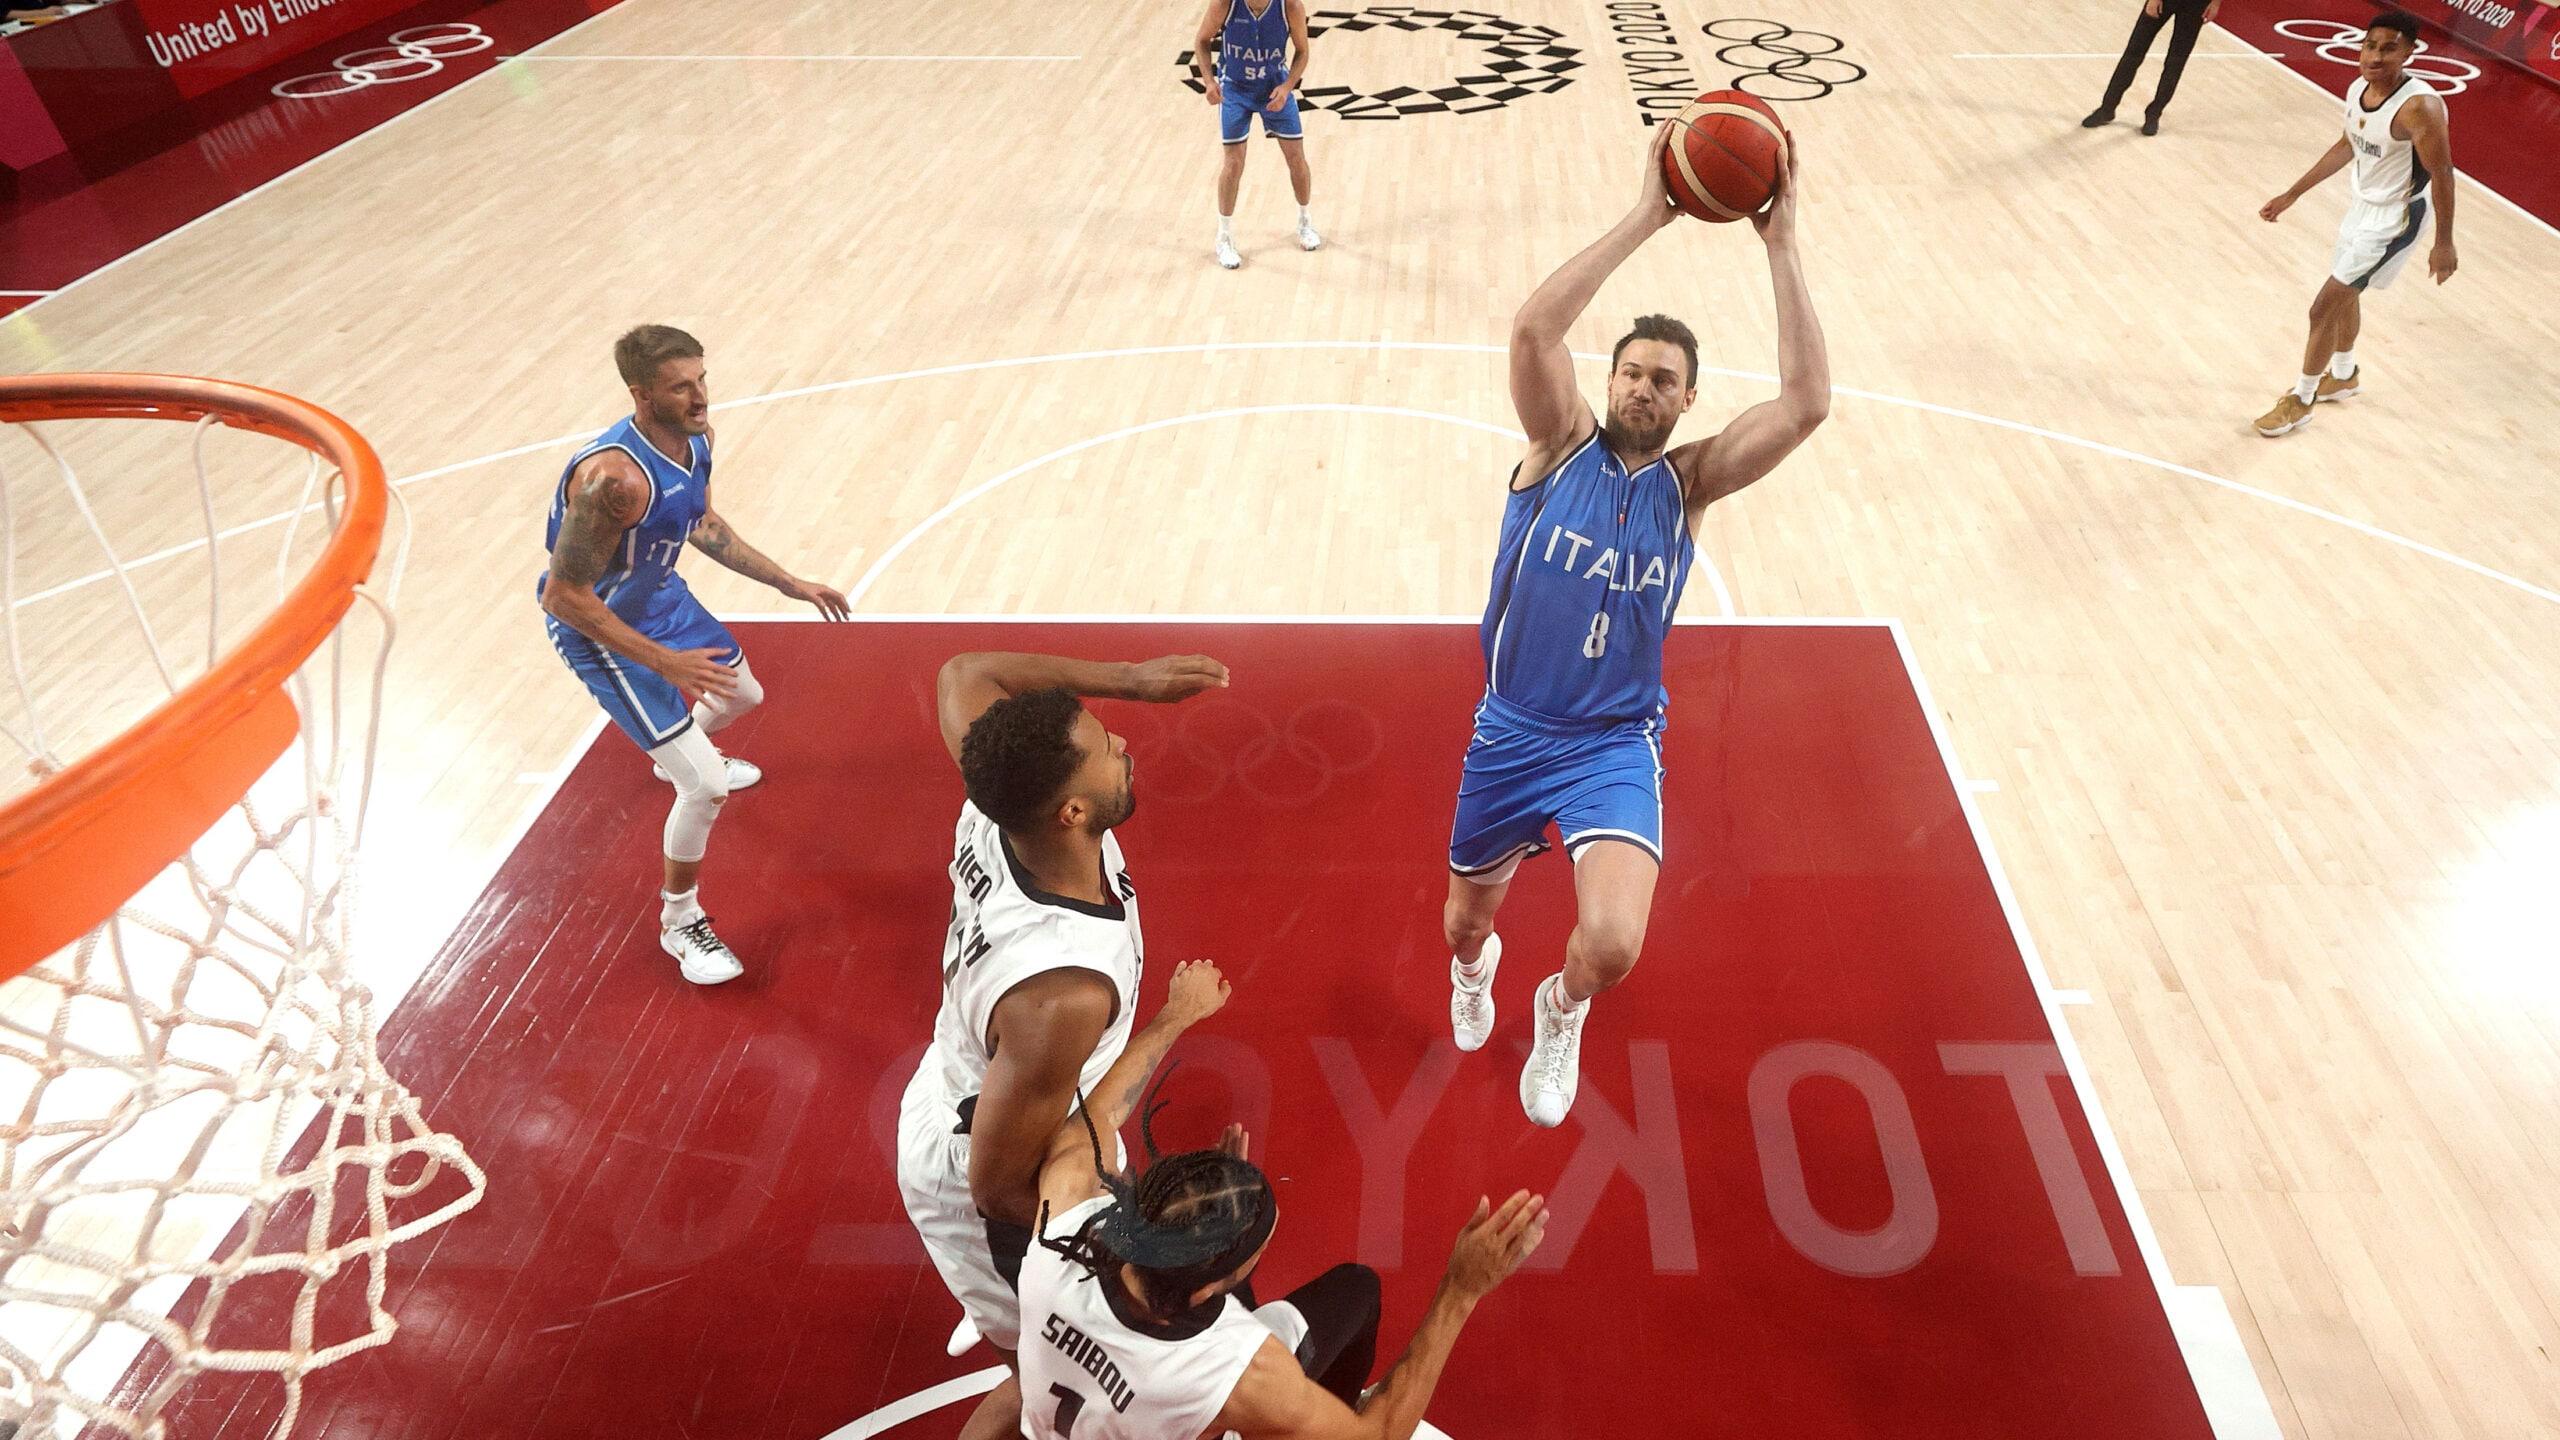 Olympic men's basketball tips off in Tokyo as Italy, Czech Republic earn wins